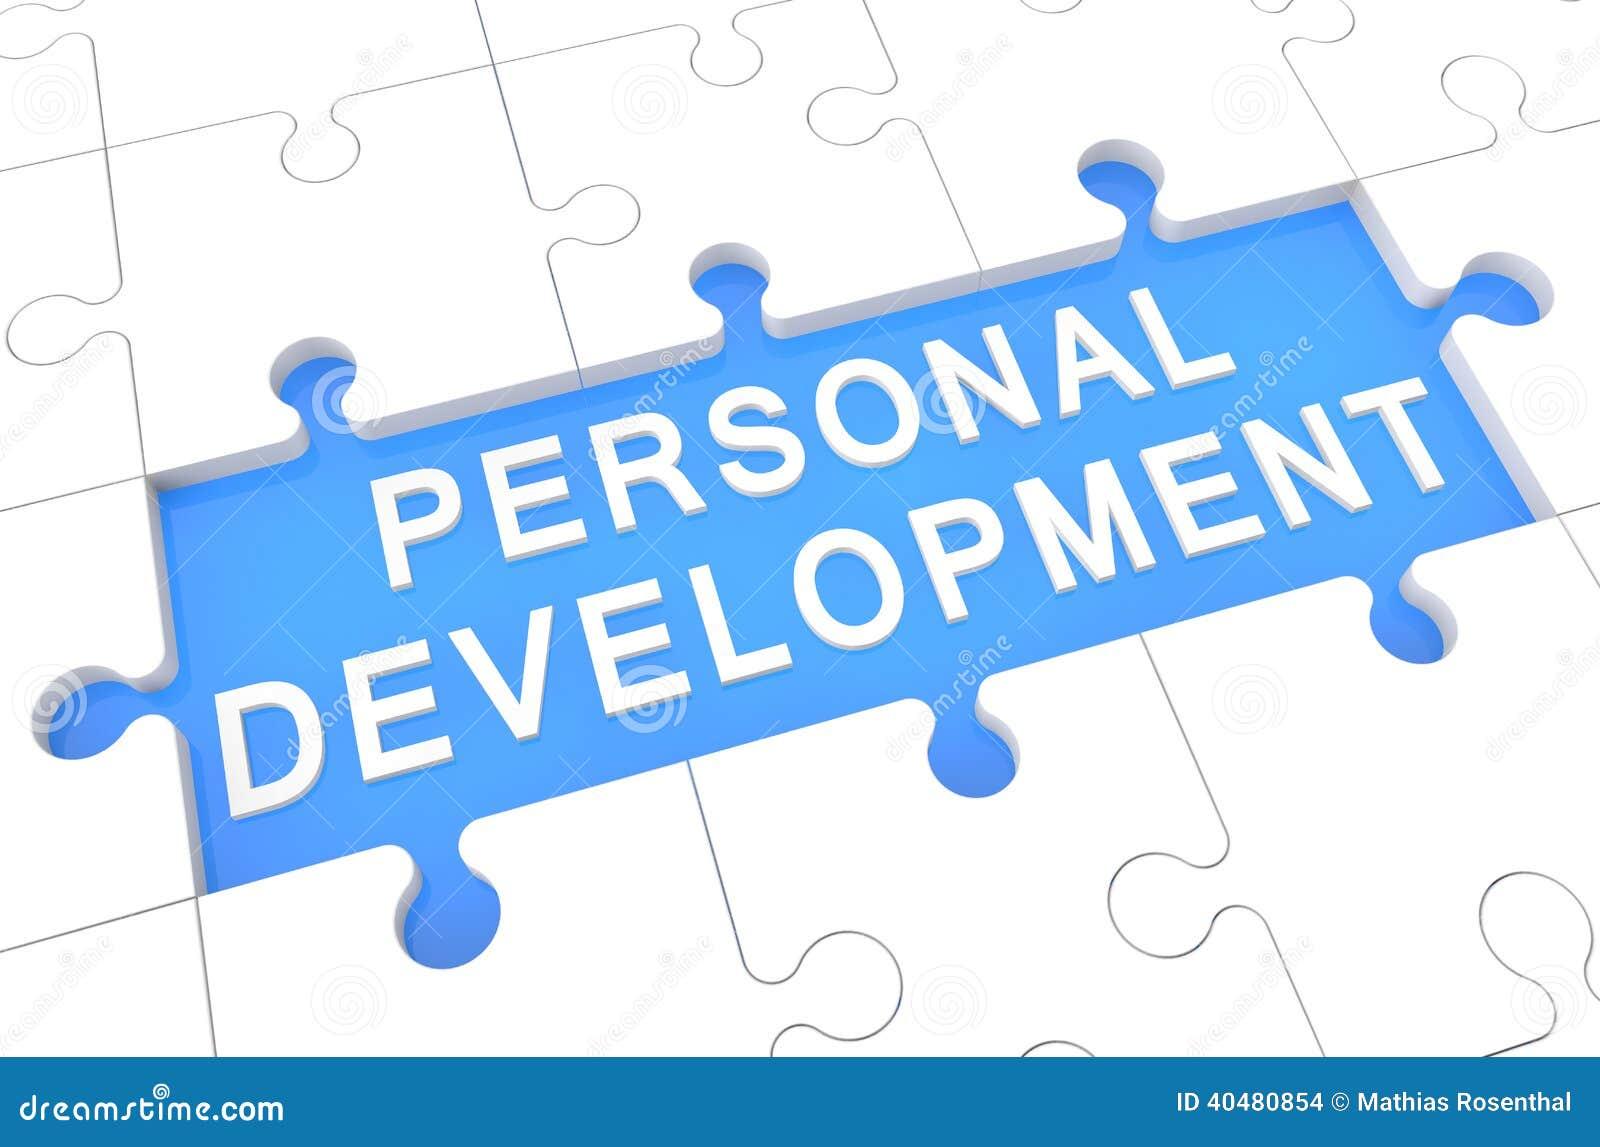 Property Development Chick : Personal development stock illustration image